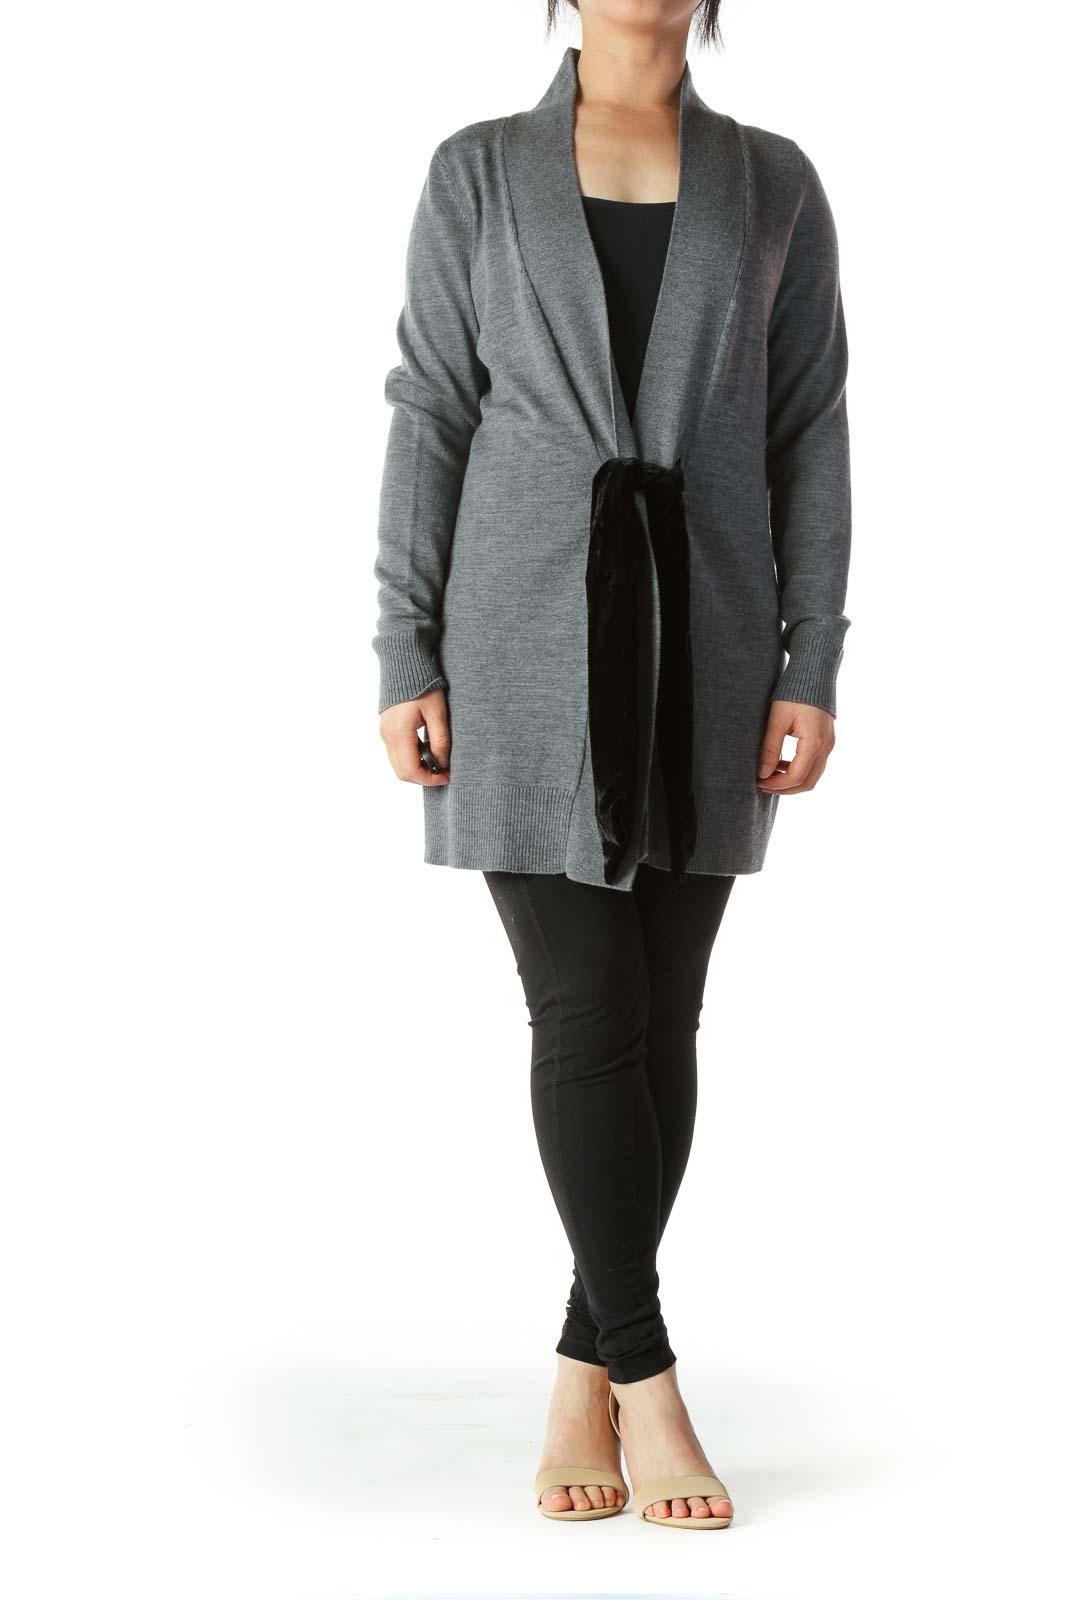 Gray Merino Wool Cardigan with Black Velvet Tie